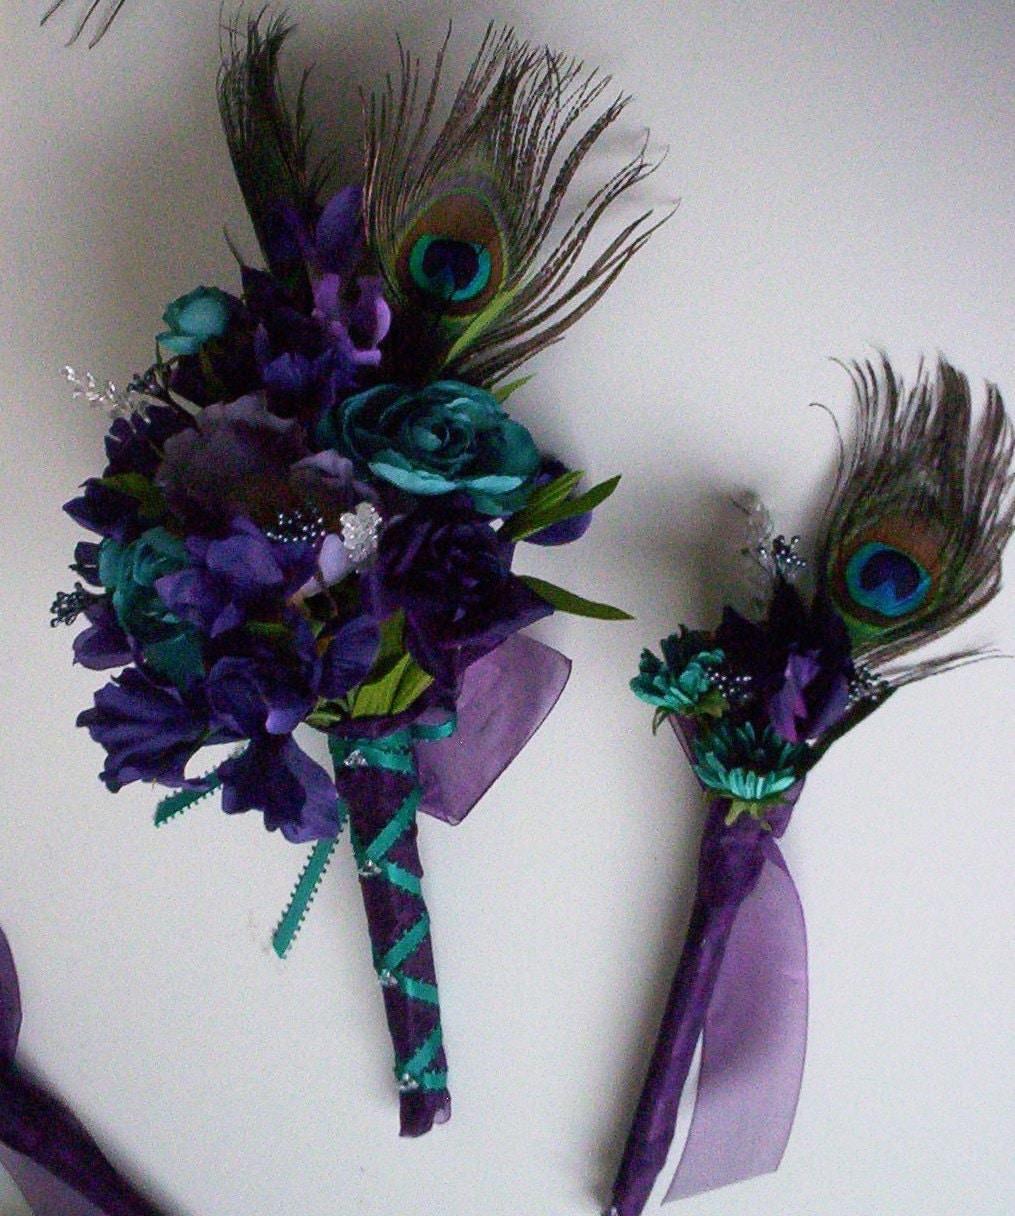 Teal Wedding Flowers Ideas: Weddings Peacock Purple Teal Bridal Bouquets 15 Piece Package